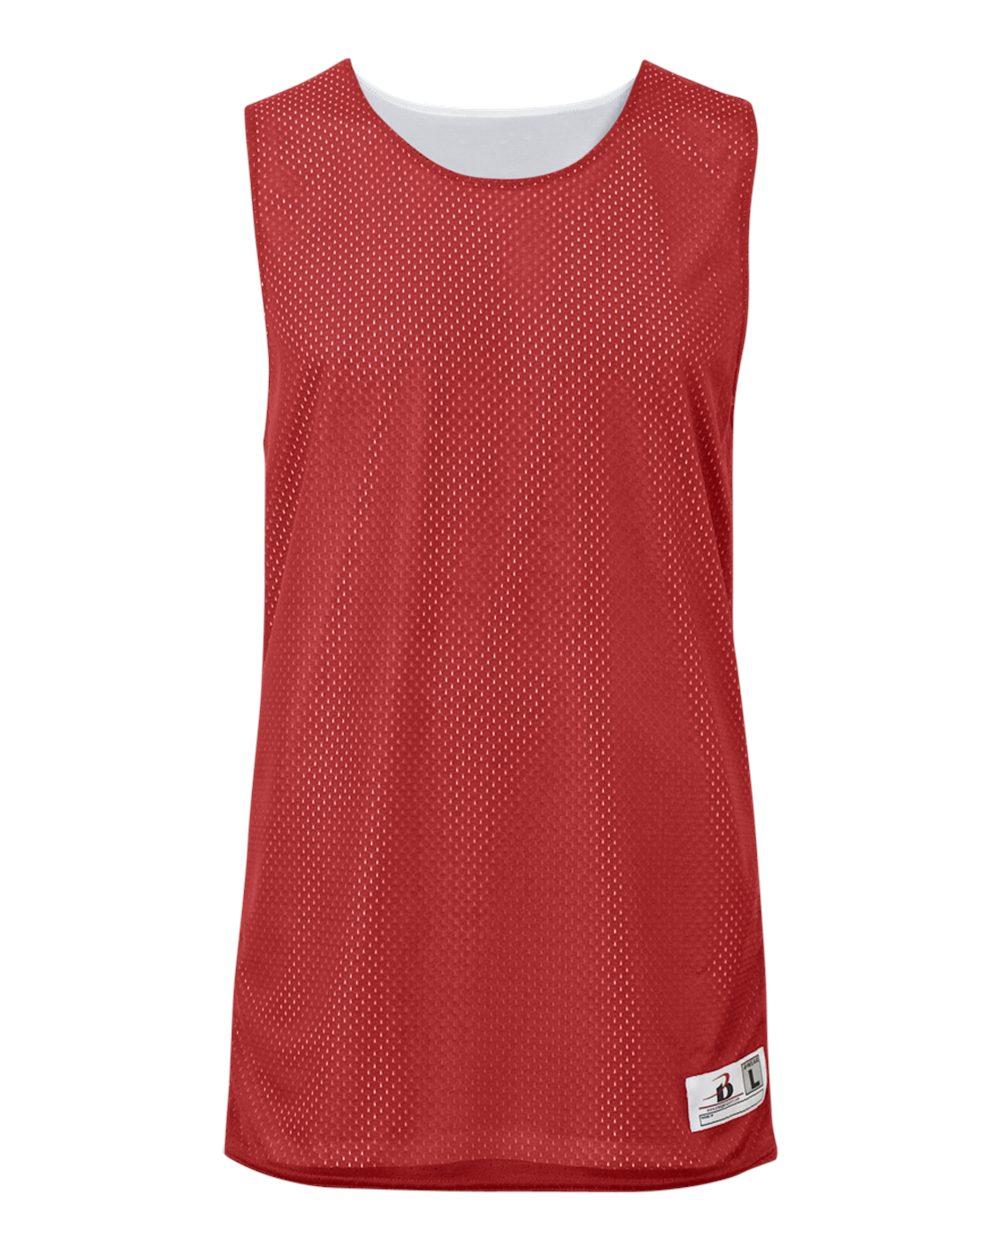 Badger Mens Challenger Reversible Basketball Jersey 8559